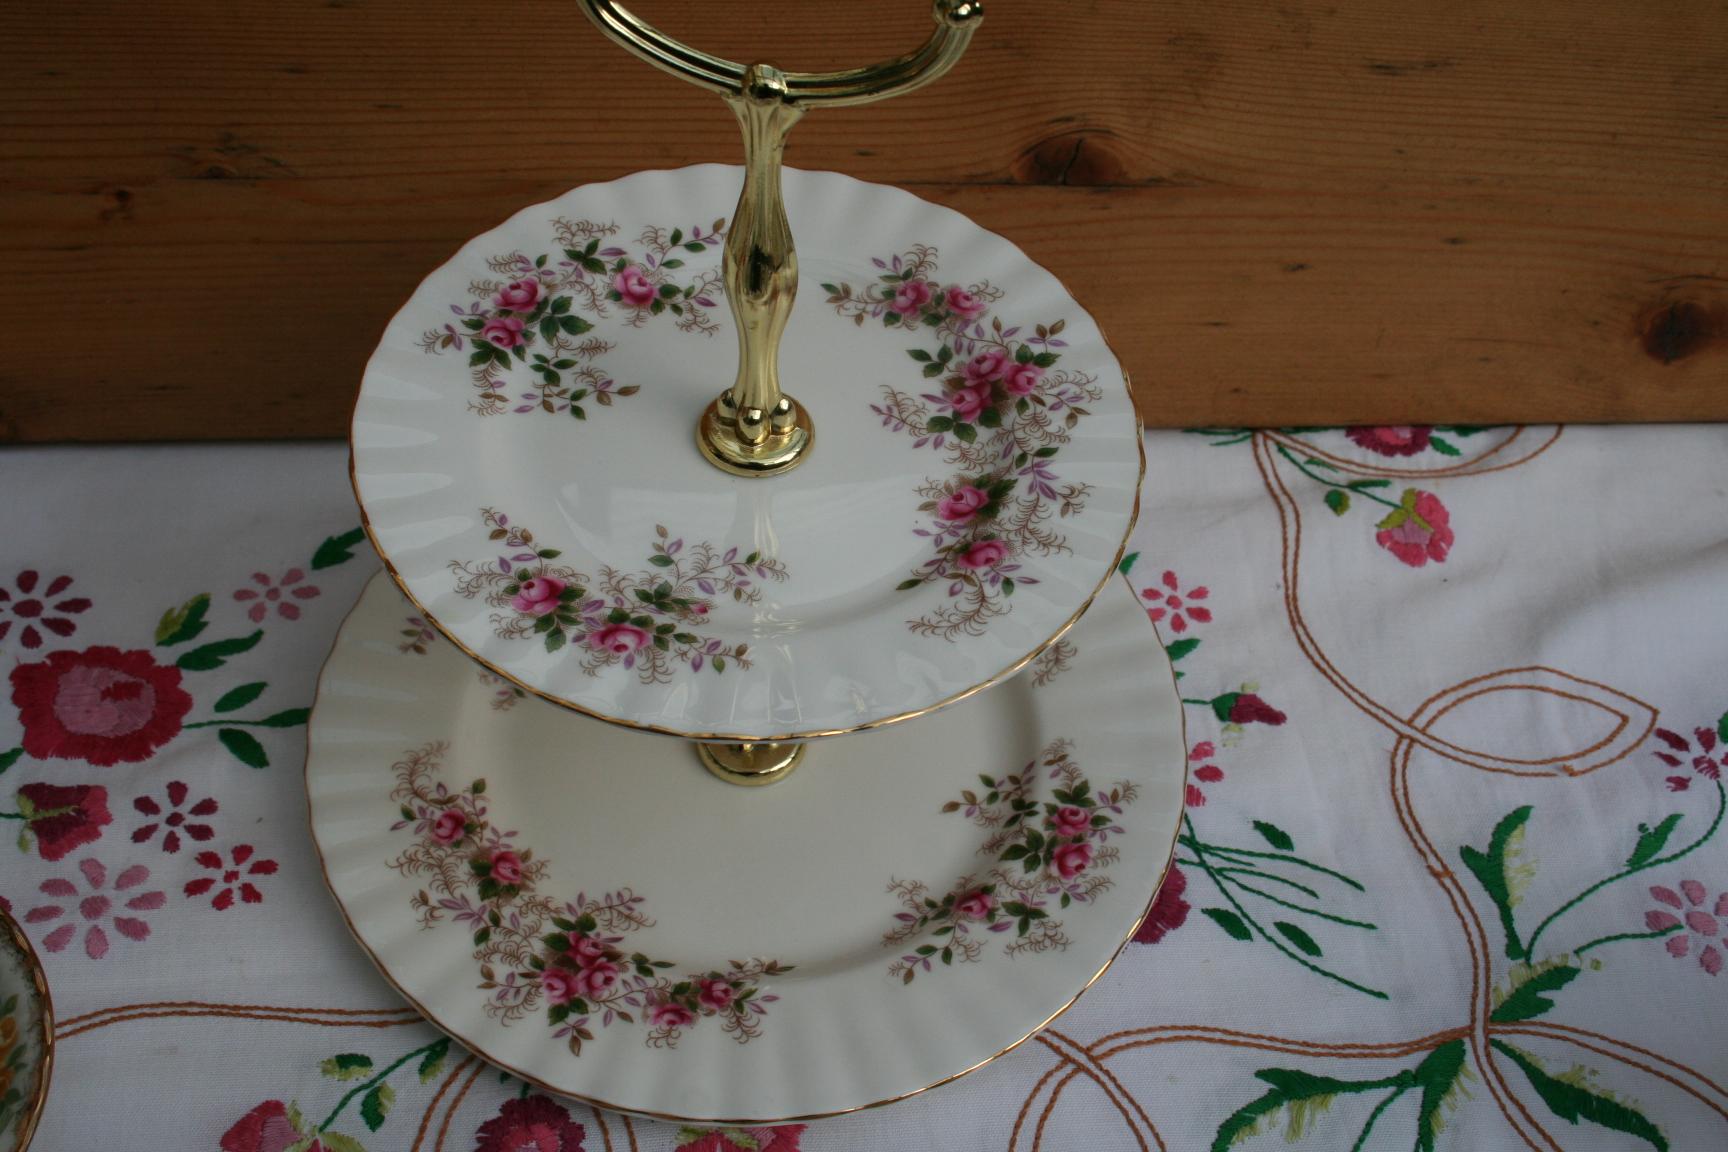 Royal Albert Servies Lavender Rose.Etagere Royal Albert Decor Lavender Rose 2 Laags Het Derde Servies